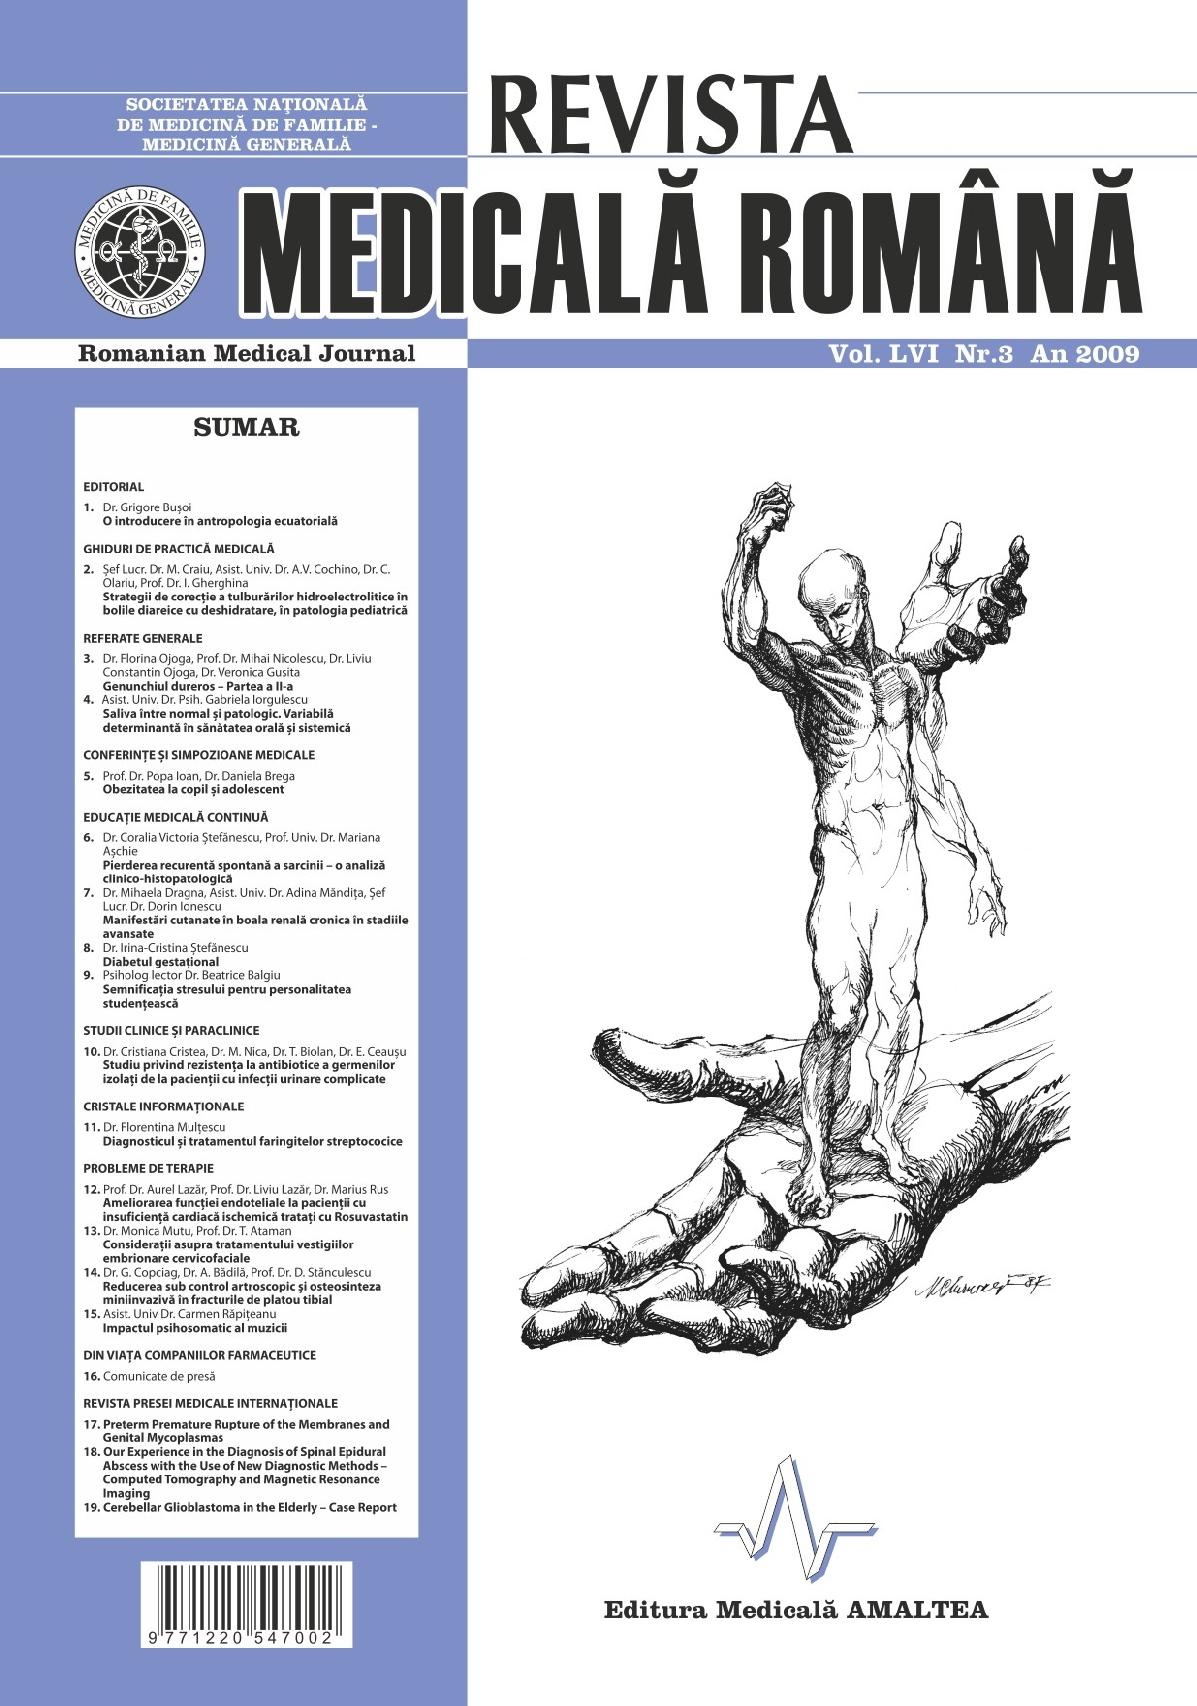 REVISTA MEDICALA ROMANA - Romanian Medical Journal, Vol. LVI, No. 3, Year 2009